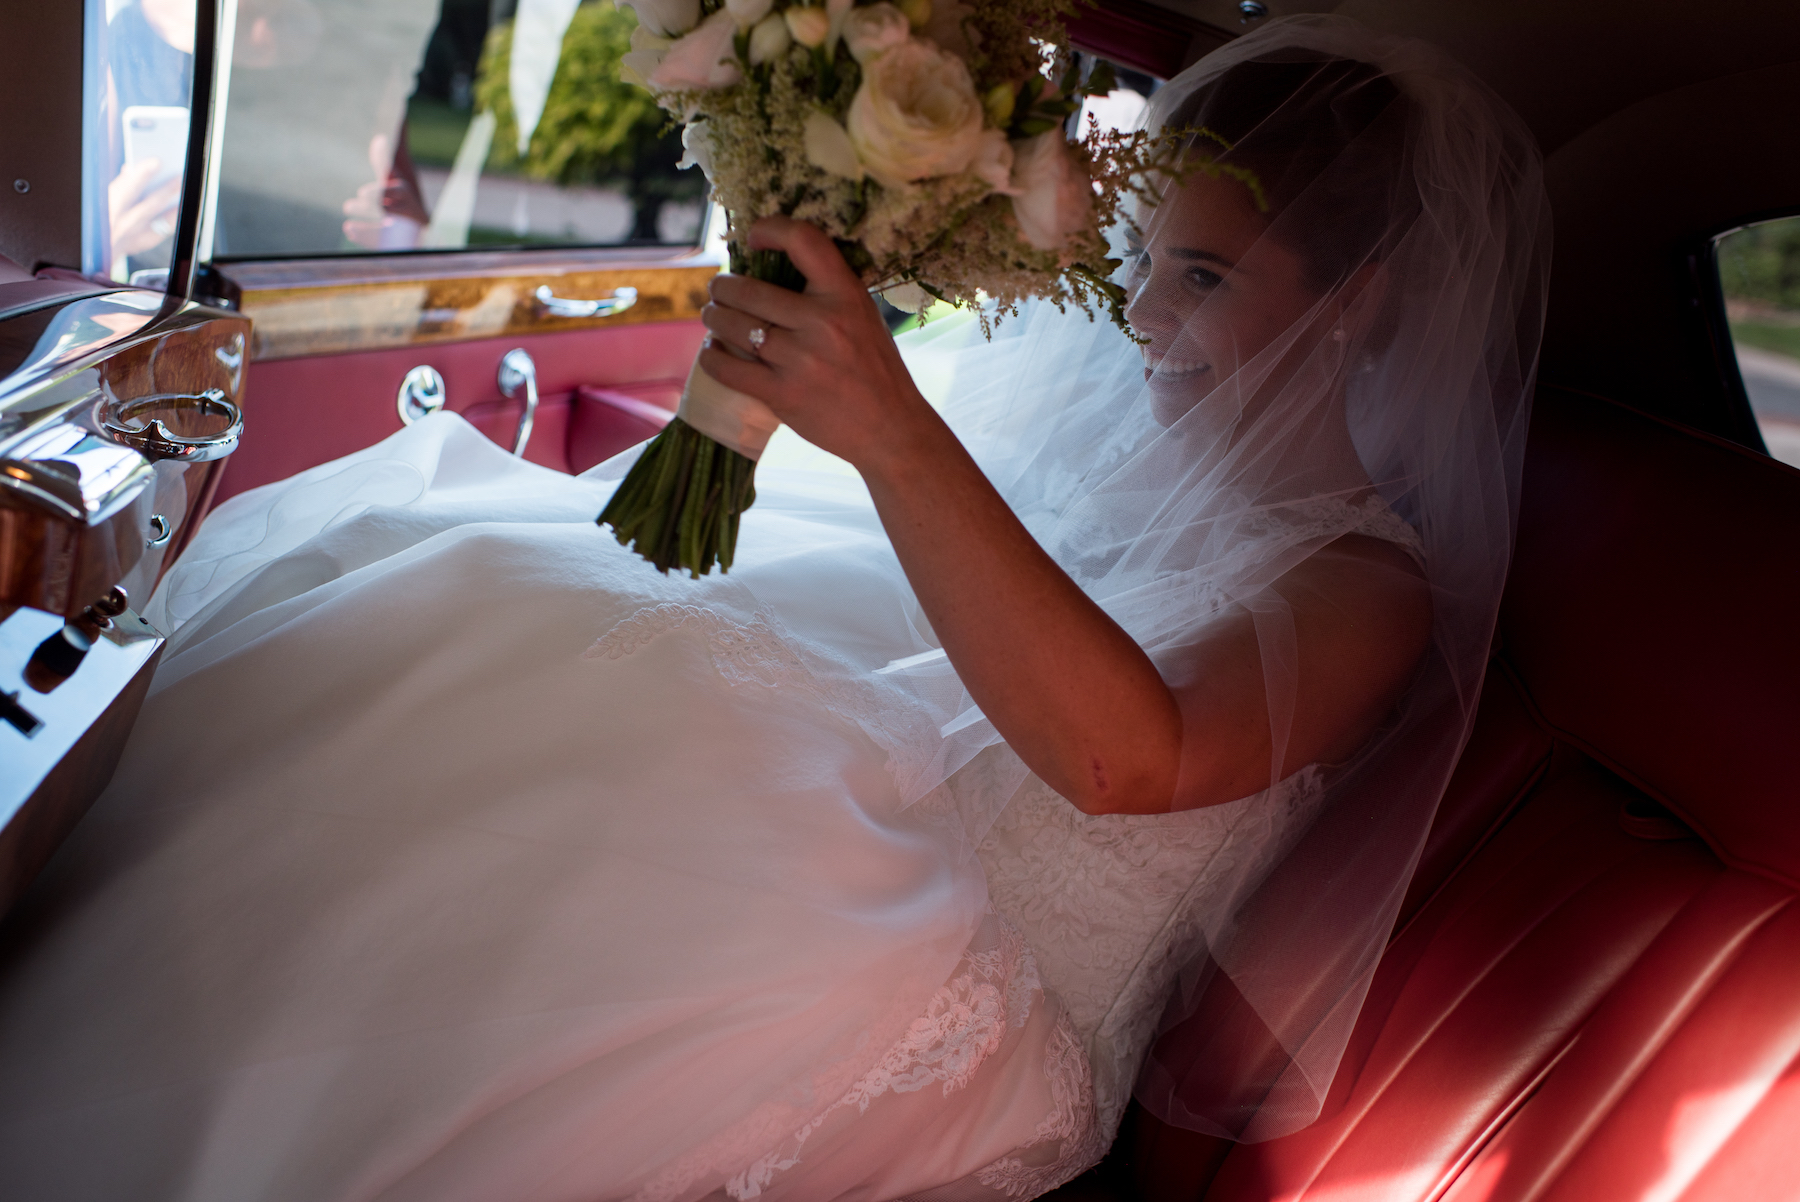 KATY-AND-TOM-HINGHAM-MASSACHUSETTS-WEDDING-DESTINATION-LUXURY-WEDDING-CATHOLIC-CHURCH-BACK-YARD-SPERRY-SAIL-CLOTH-TENT-COASTAL-CHIC-TIMELESS-ROMANTIC